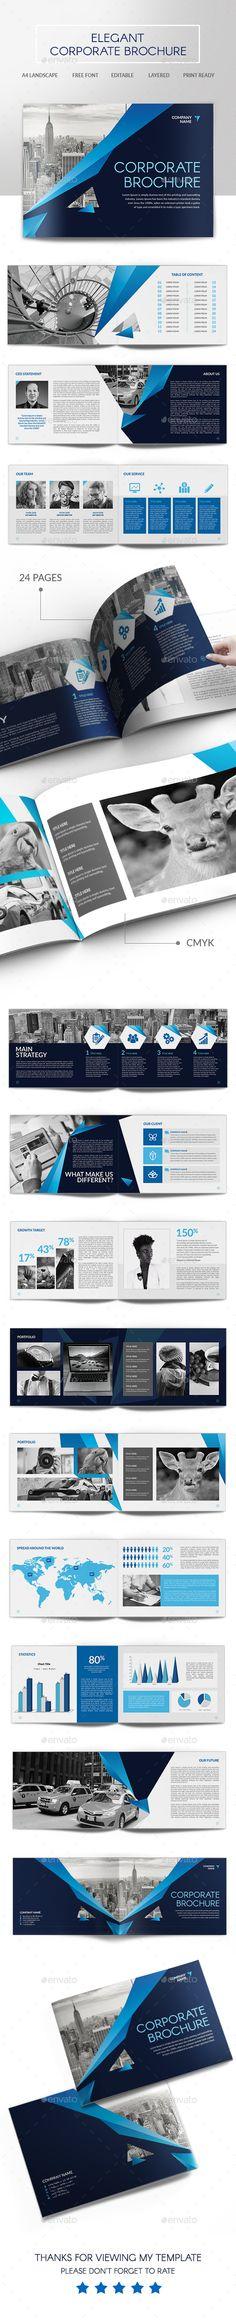 Elegant Corporate Brochure Brochures - manual cover page template